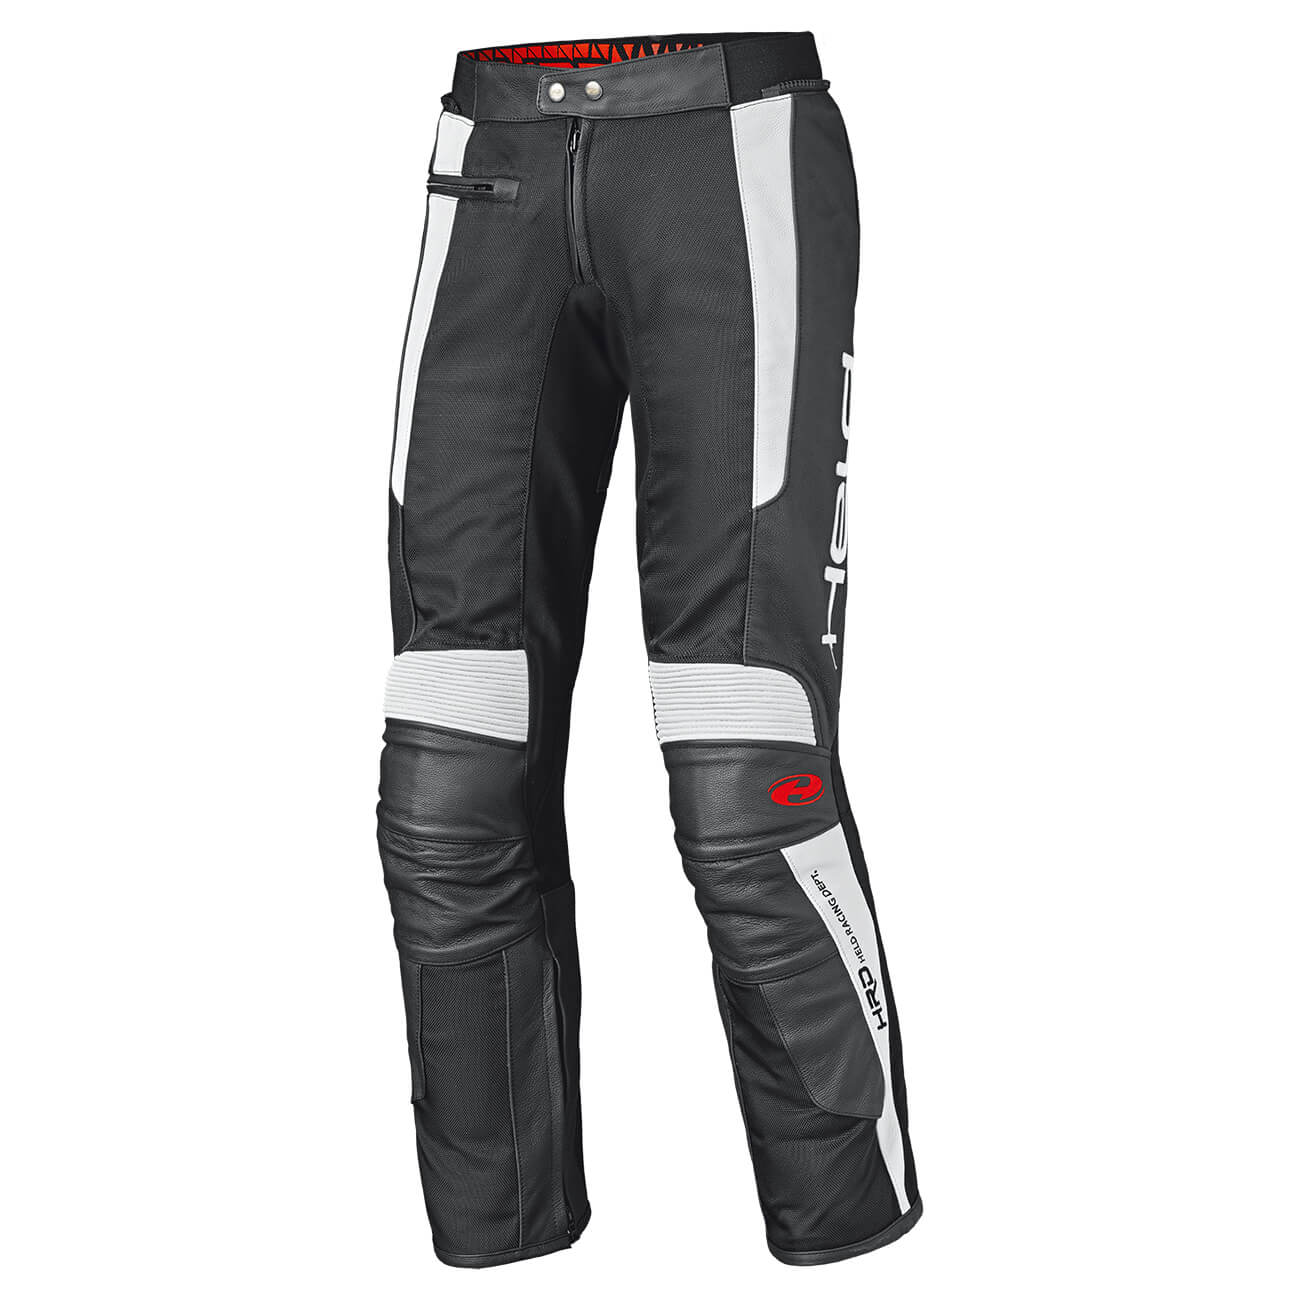 ca0edb527ae7 pánske športové nohavice Takano II